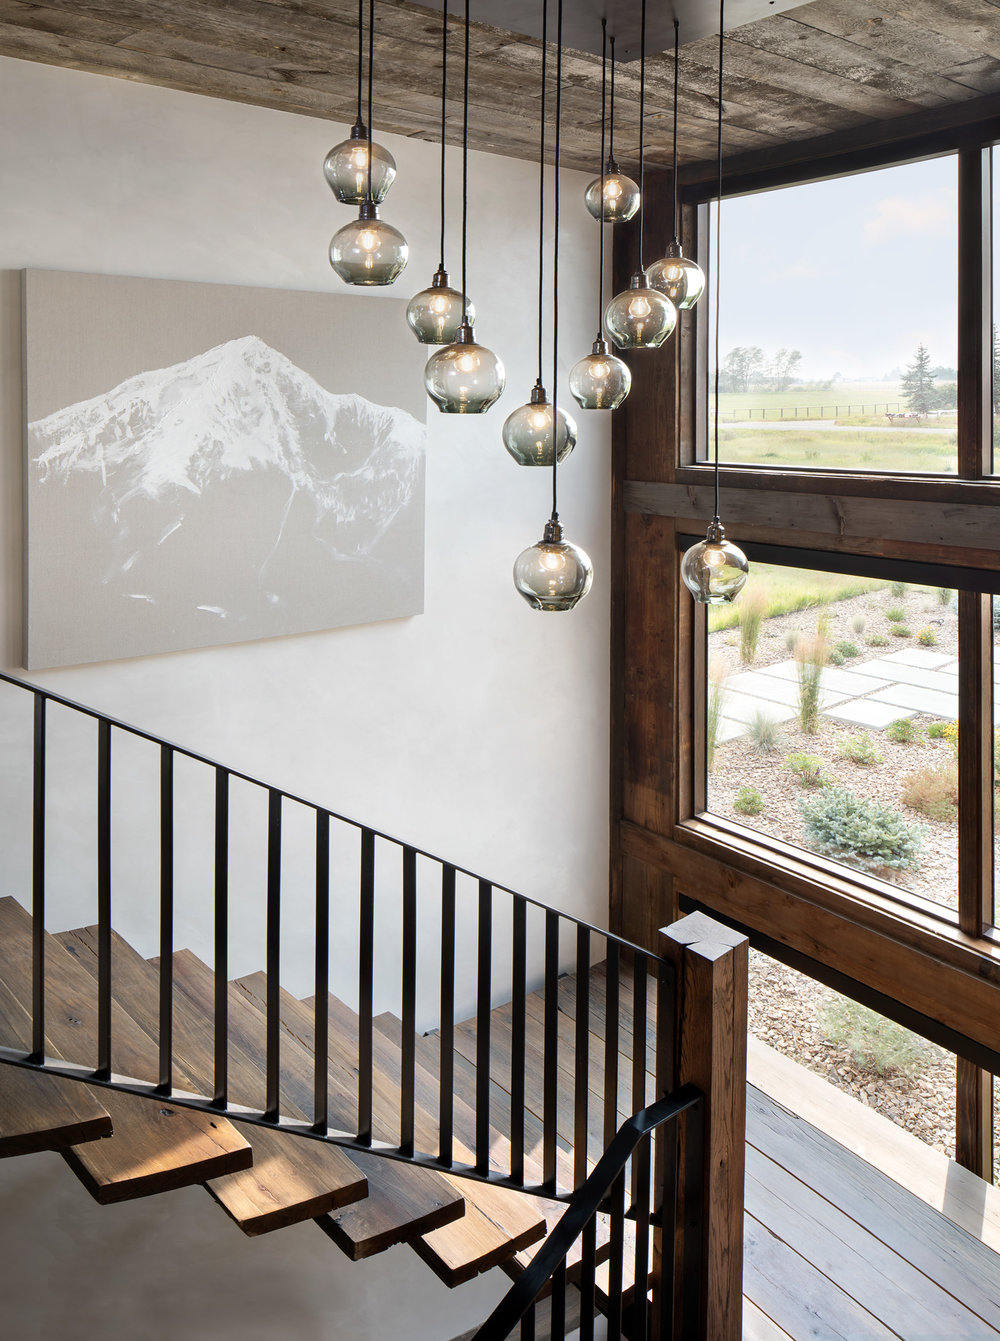 Glass Cluster Pendants   by OM STUDIOS - ONA MAGARO    Lone Peak IV   by SANDY EPSTEIN